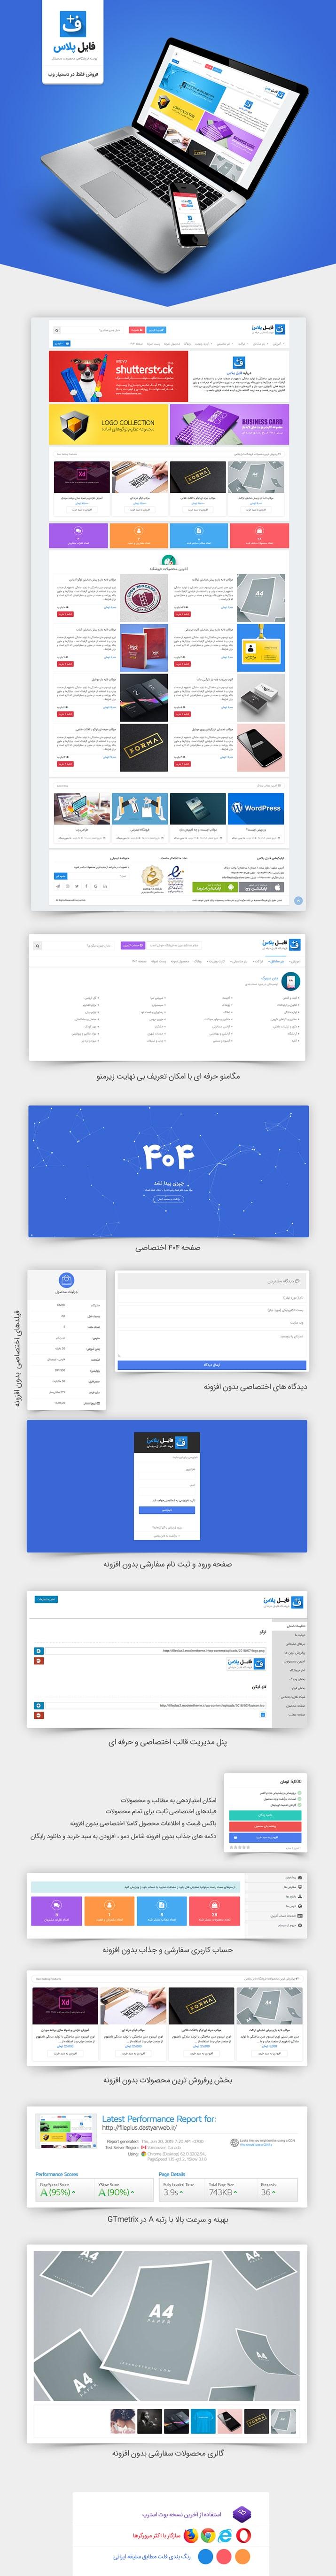 قالب fileplus | قالب فروش فایل وردپرس فایل پلاس